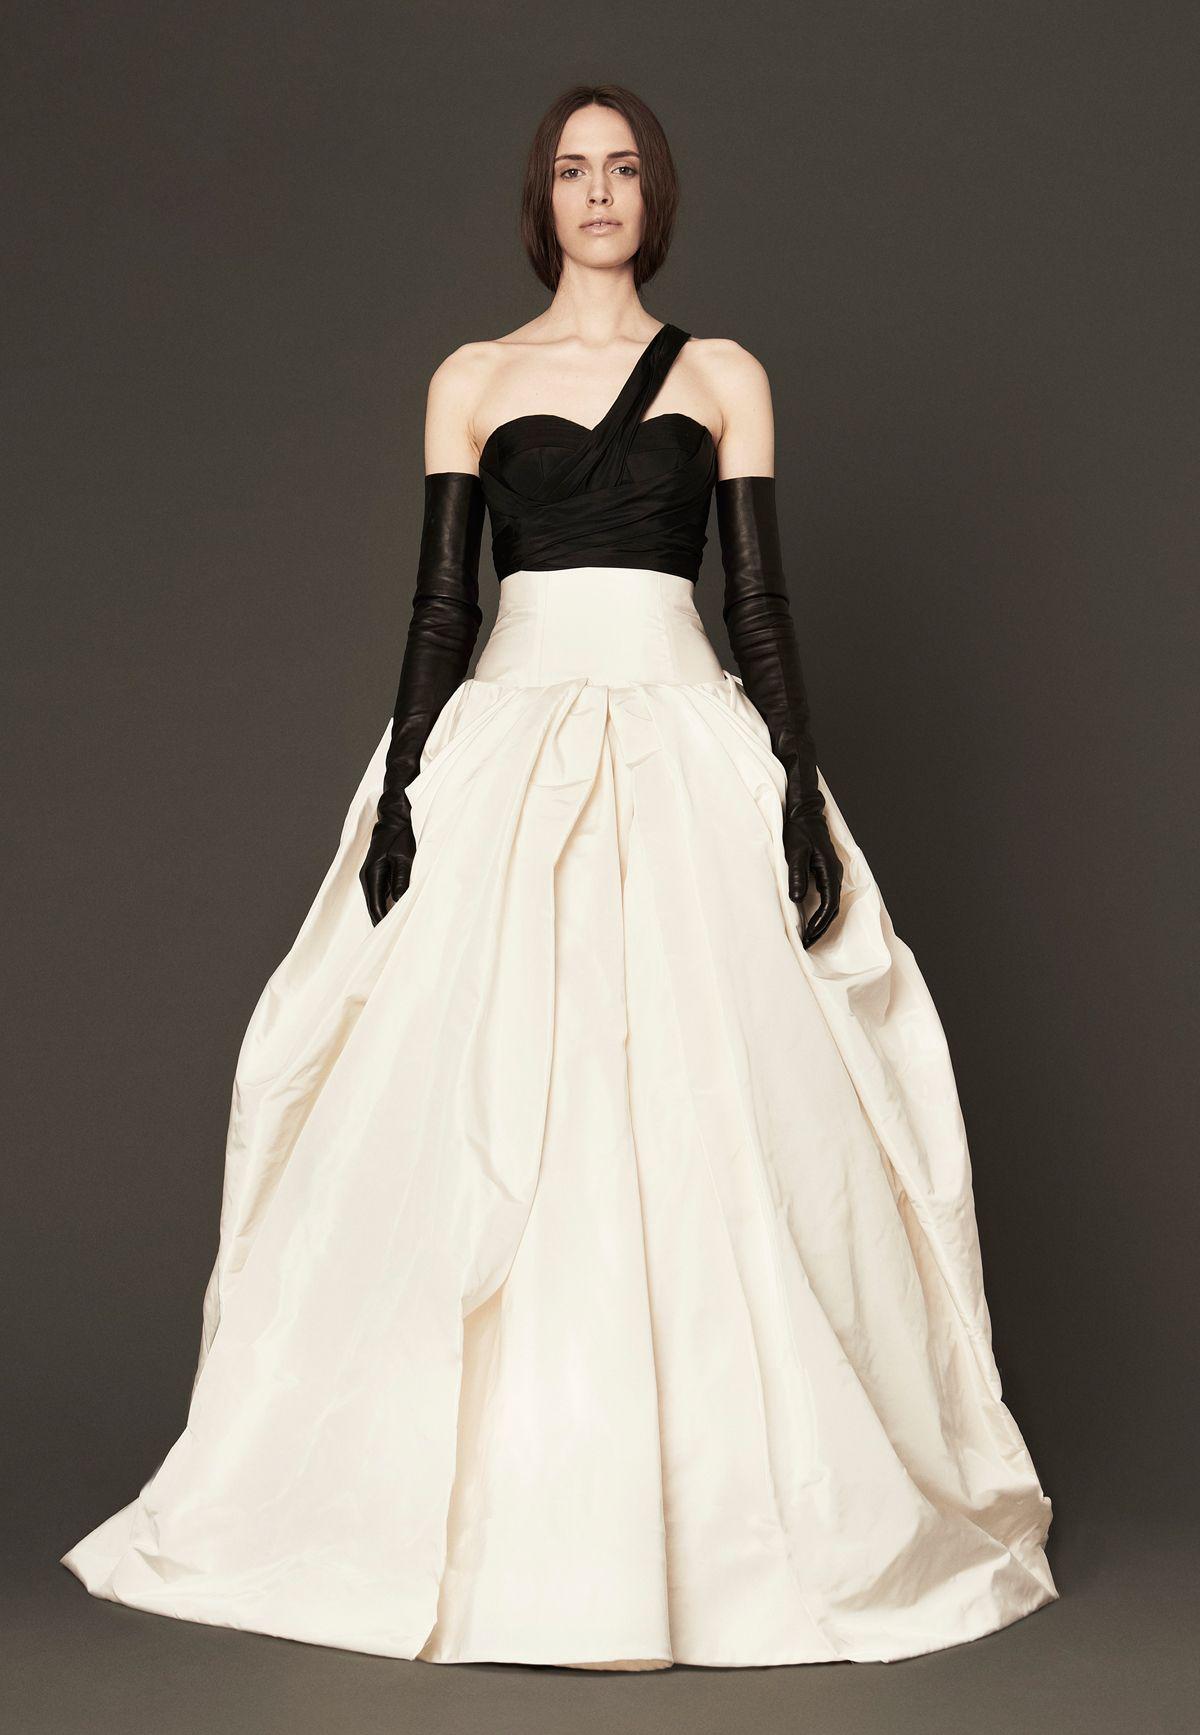 2000s Crinoline inspired wedding dress presented by the Vera Wang ...